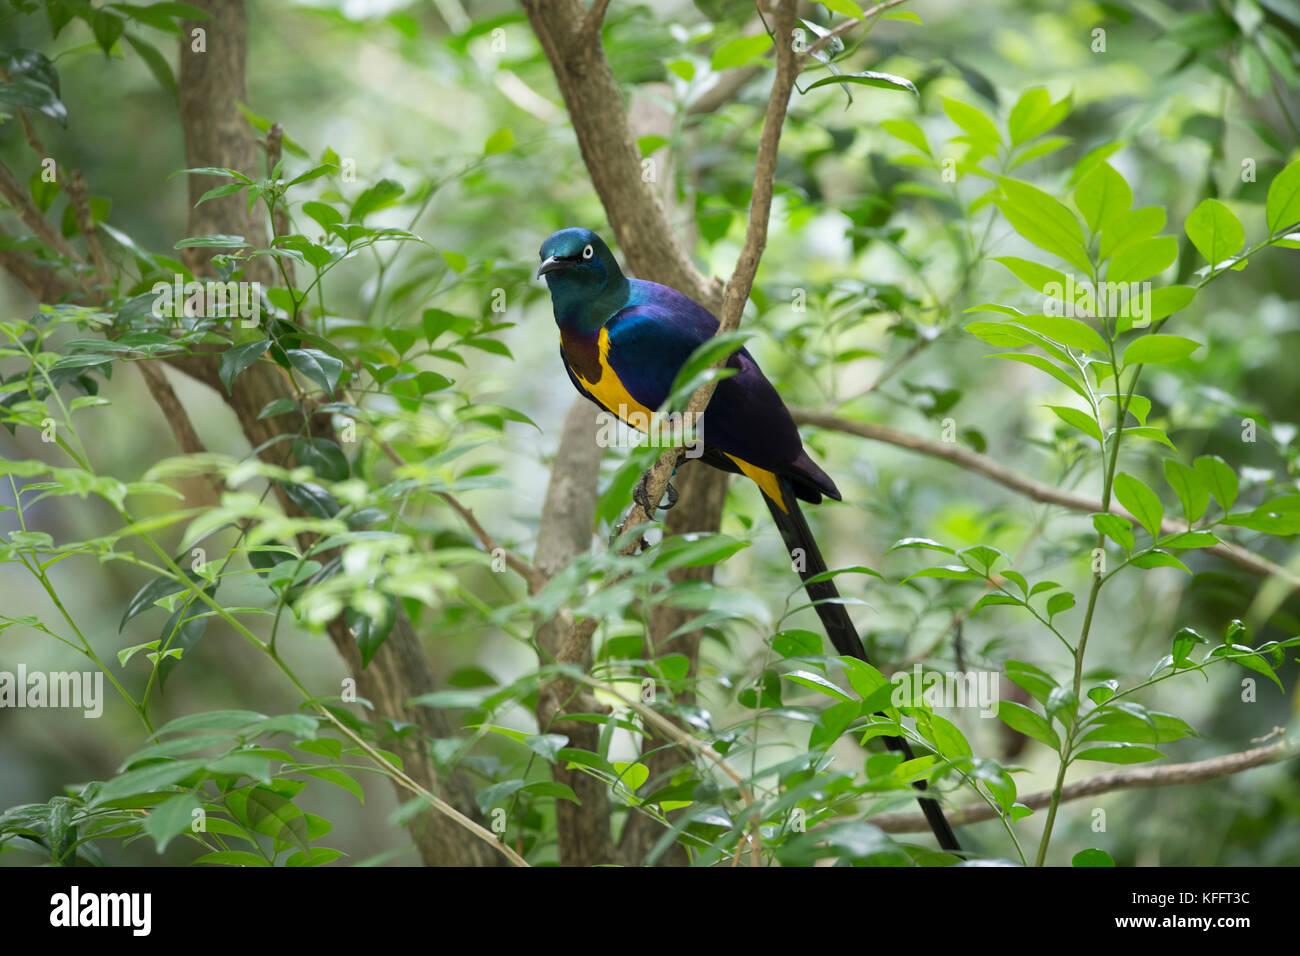 Golden-breasted starling Lamprotornis regius Jurong Bird Park Singapore BI031745 Stock Photo